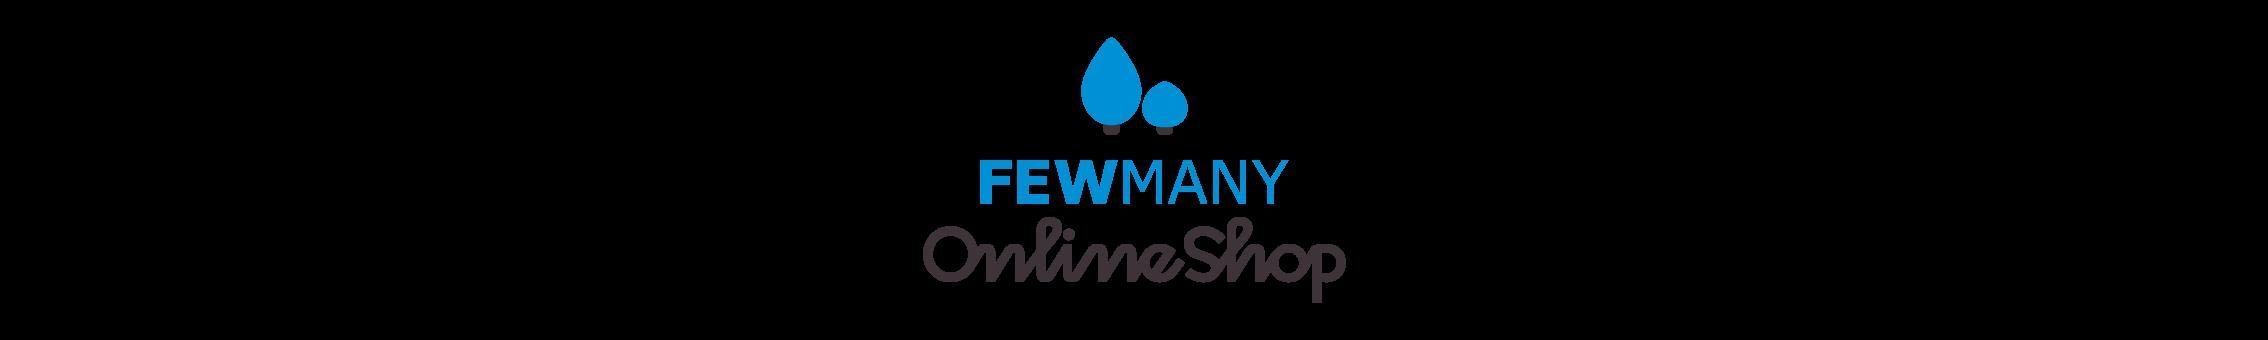 FEWMANY ONLINE SHOP